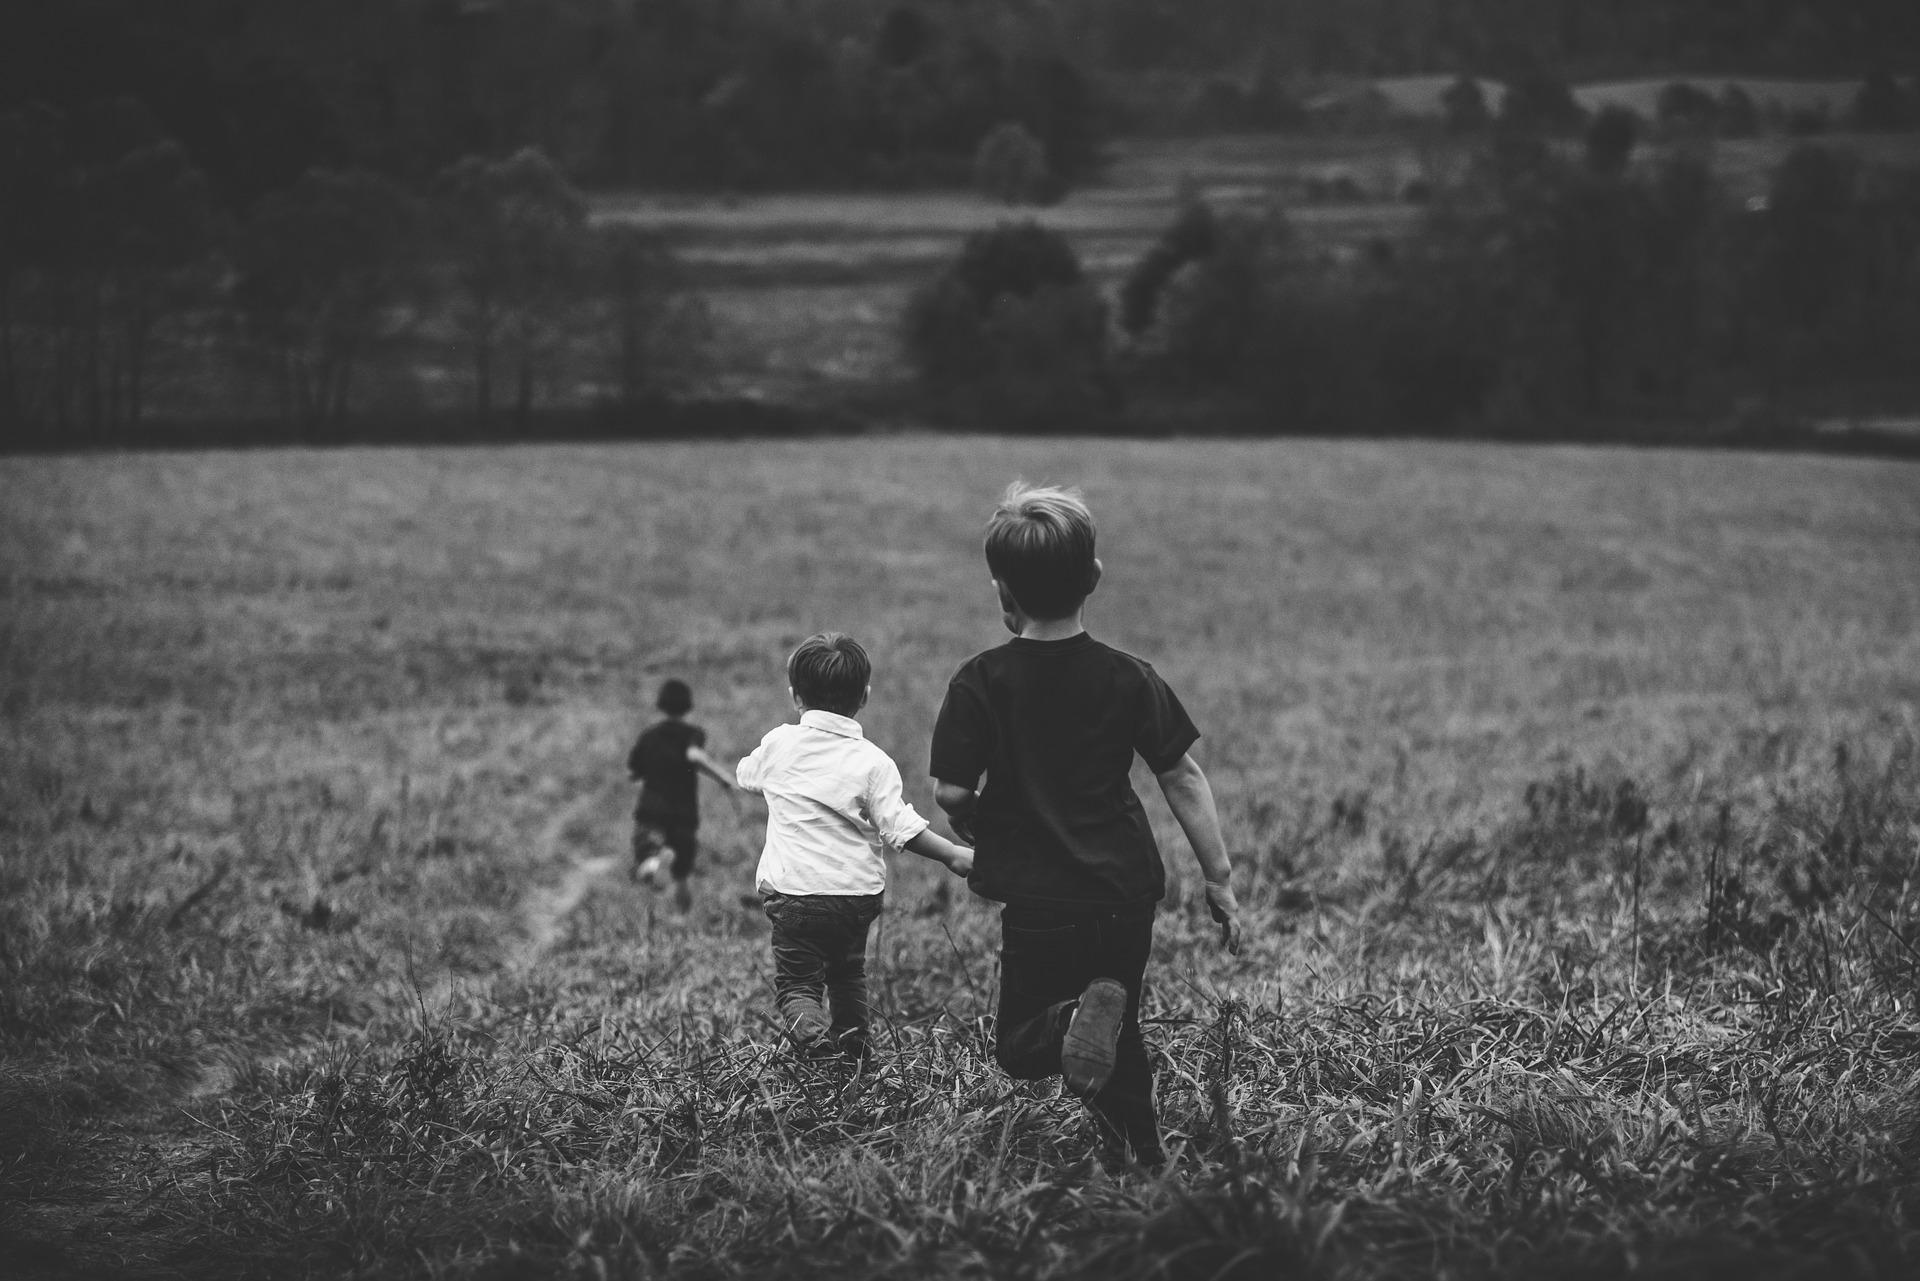 Staying Childish Through Adulthood